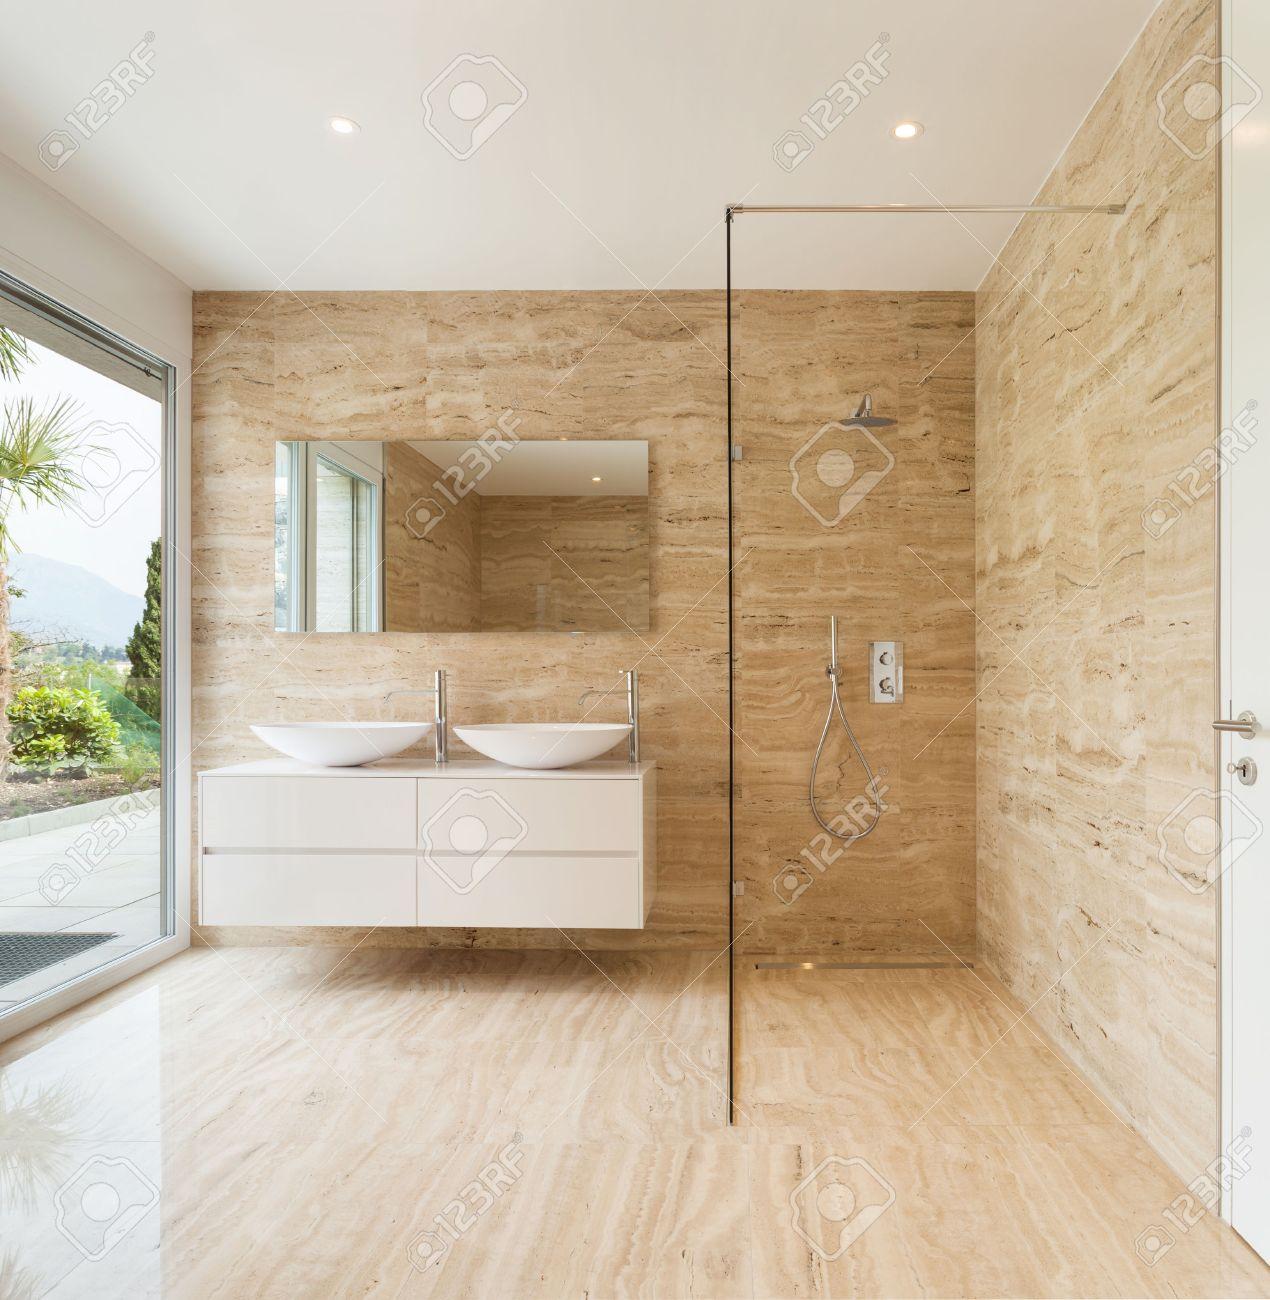 Nice Modern Bathroom Going To Die Marble Walls Stock Photo   33885616